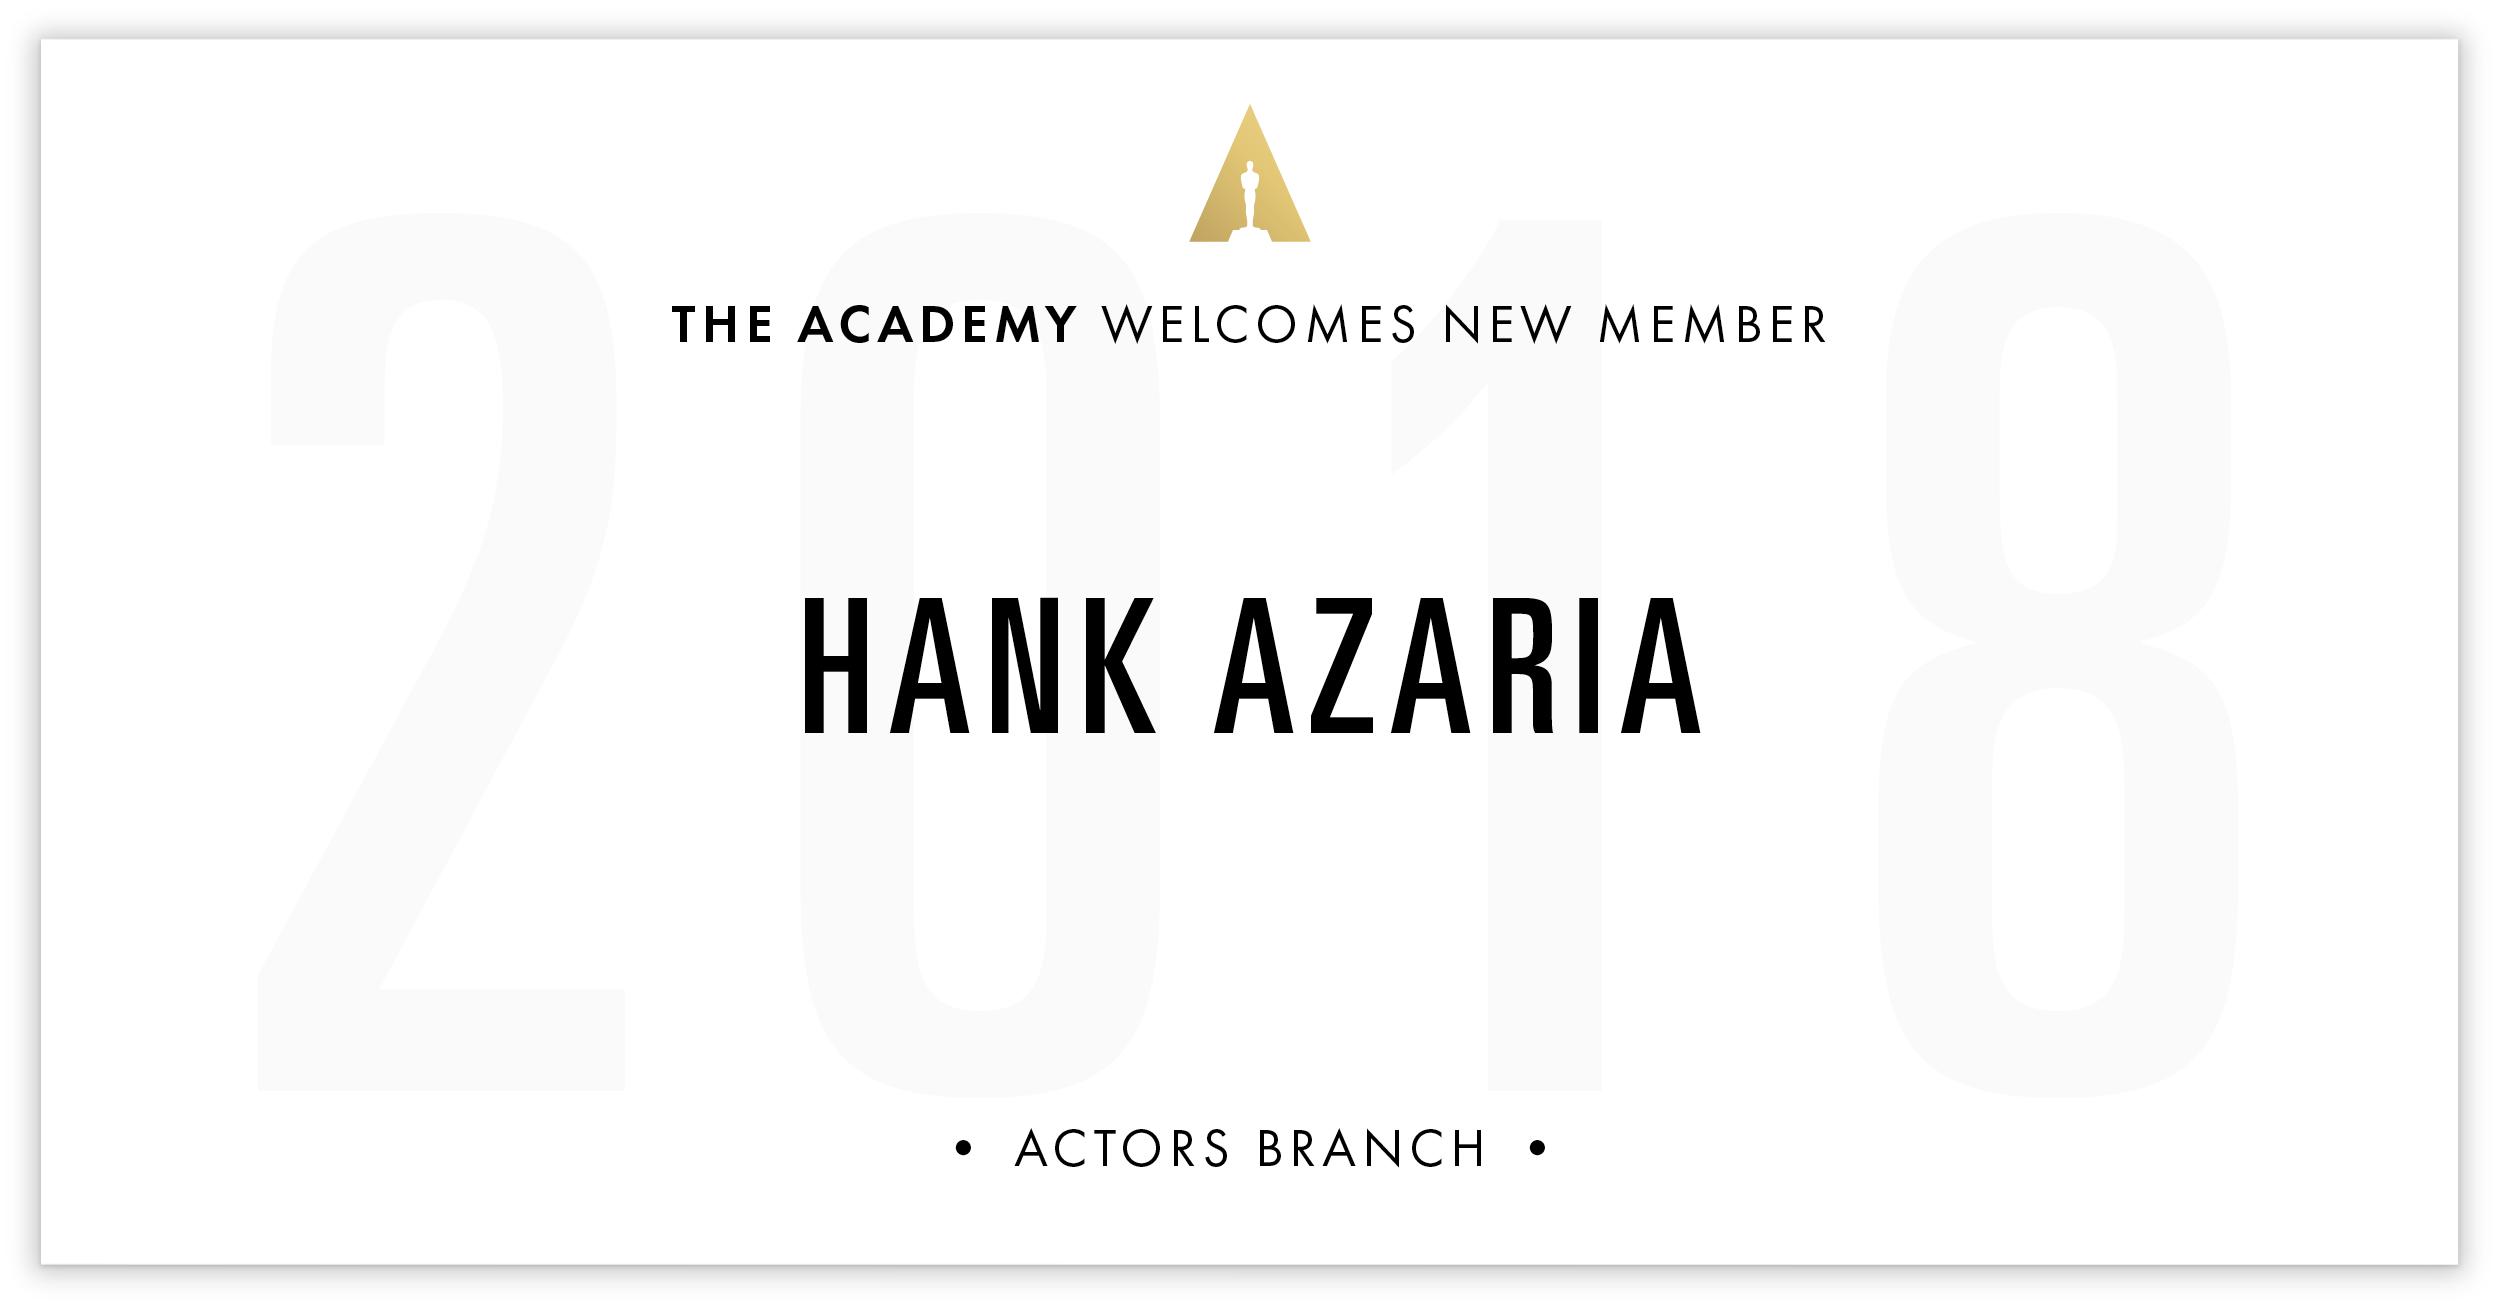 Hank Azaria is invited!